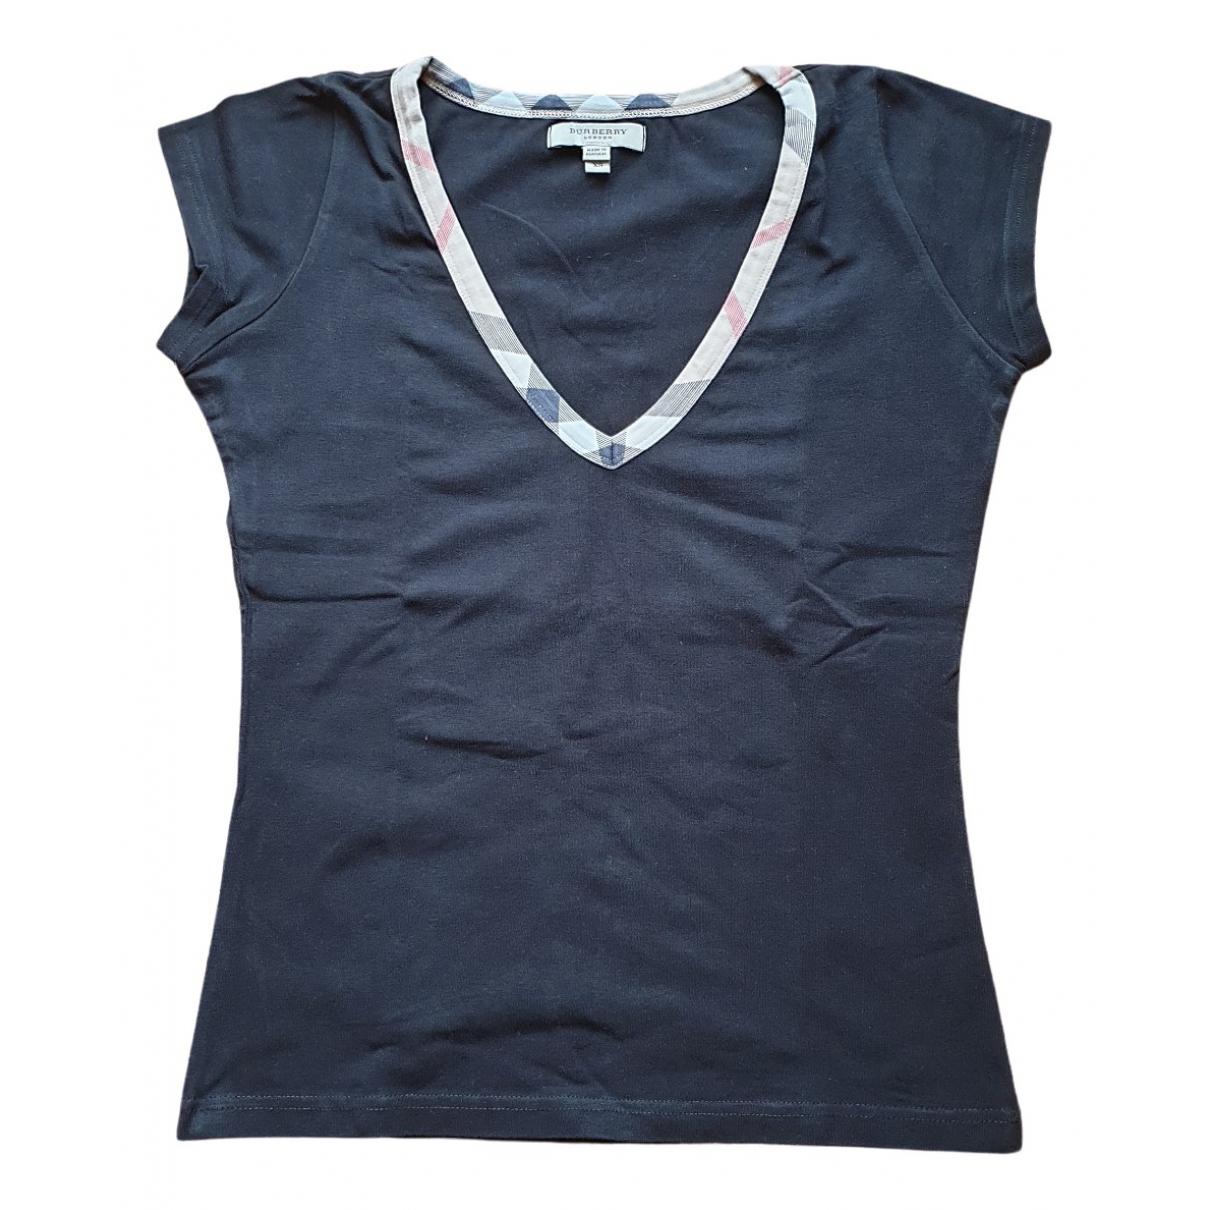 Burberry \N Black Cotton  top for Women 36 IT